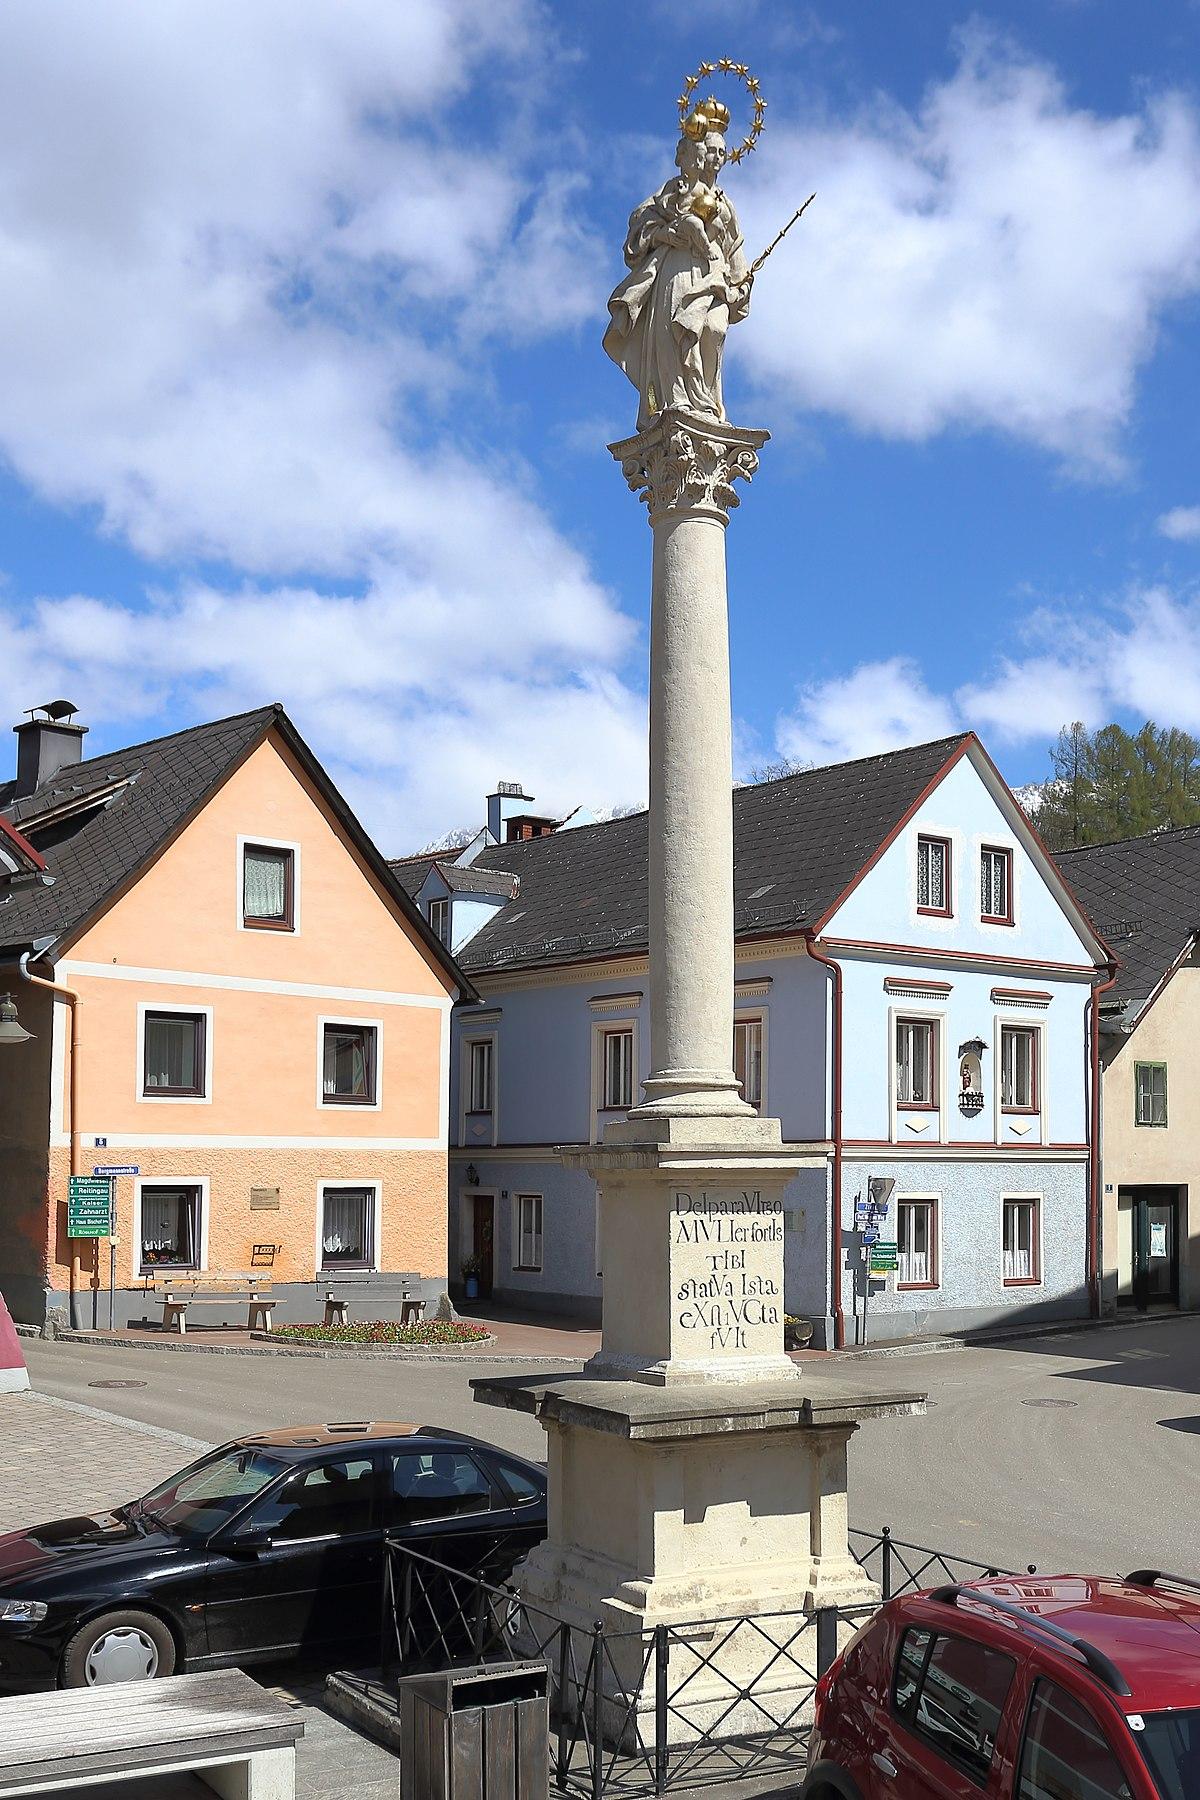 Datei:AUT Mautern in Steiermark comunidadelectronica.com Wikipedia